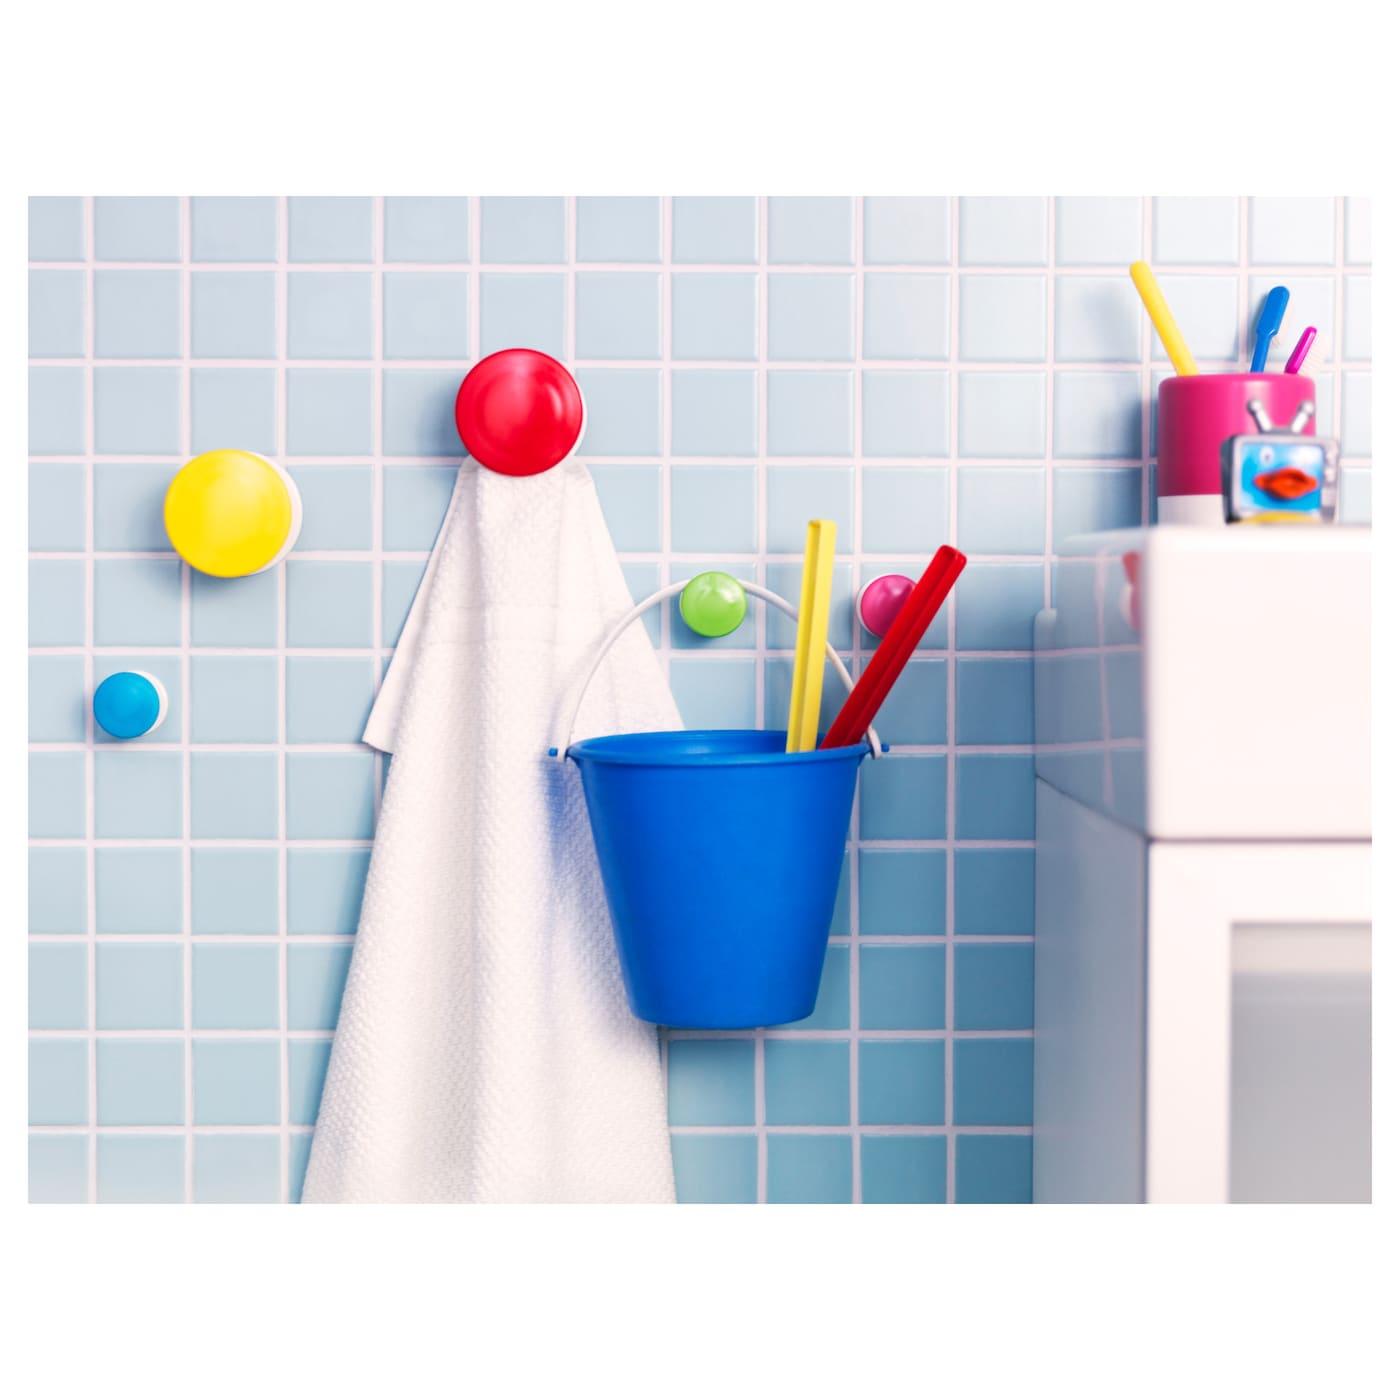 Losjon Perchero Colores Variados Ikea - Colores-ikea